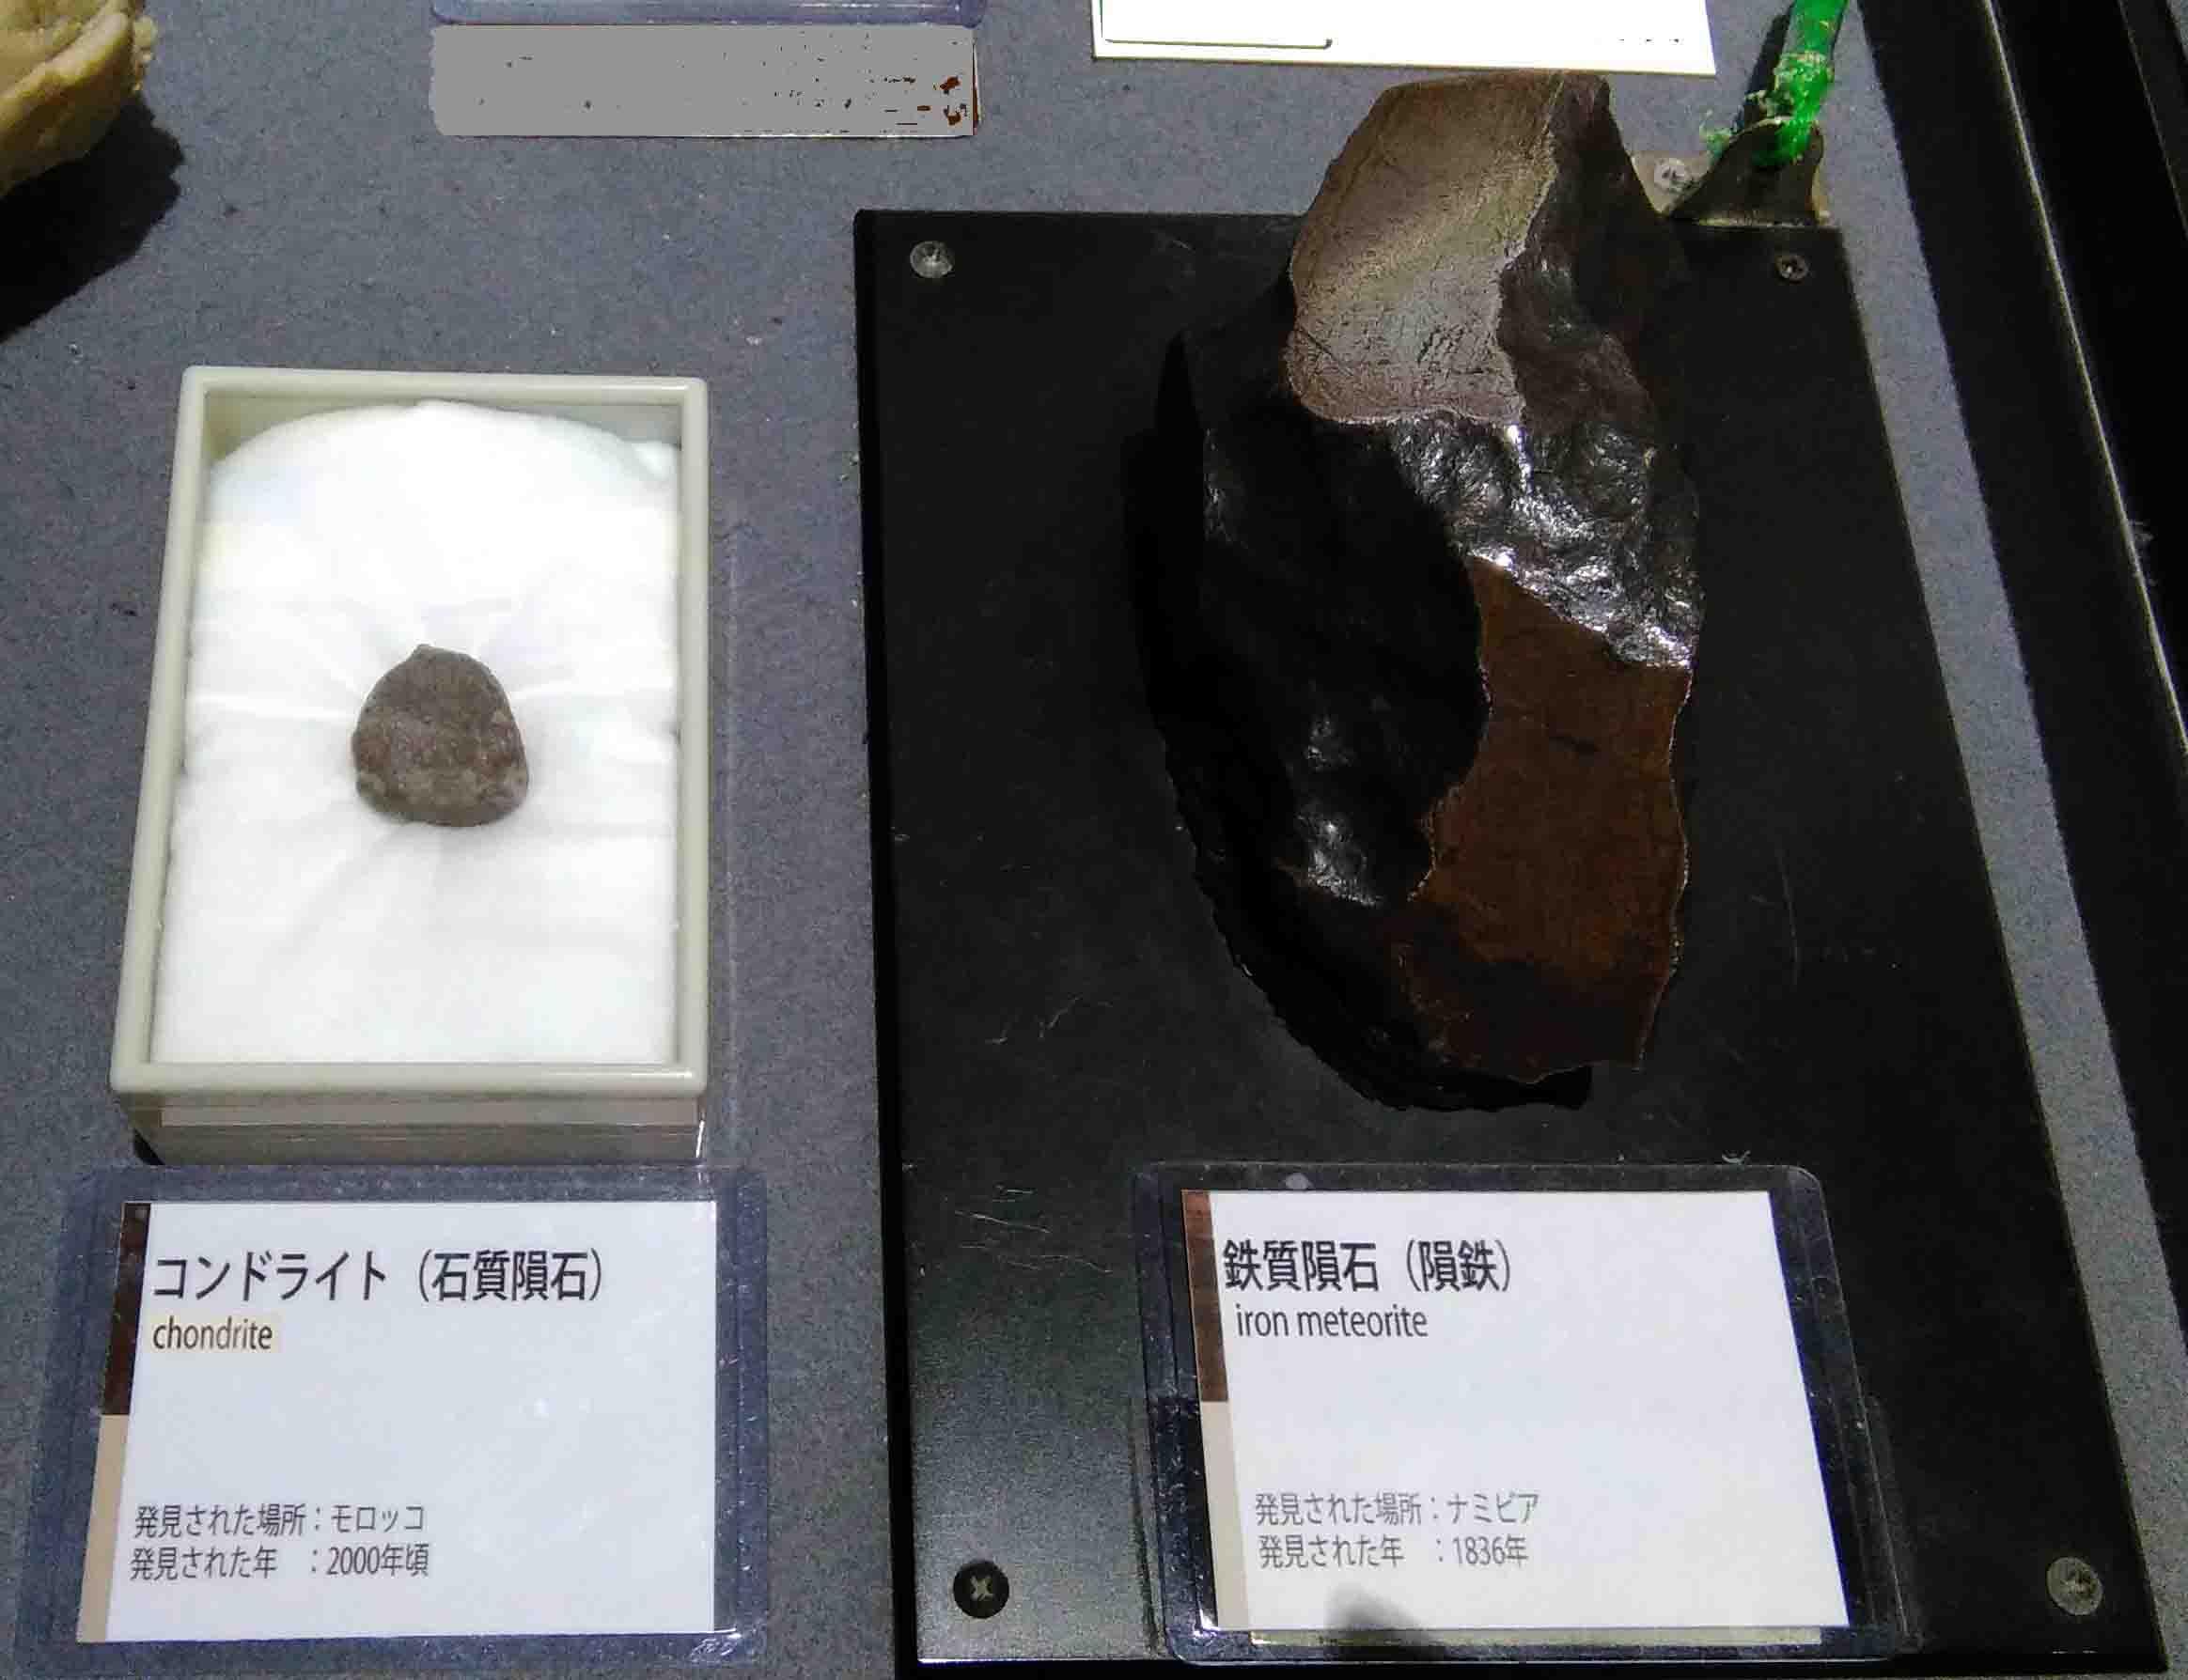 隕石2IMG_20161202_135829